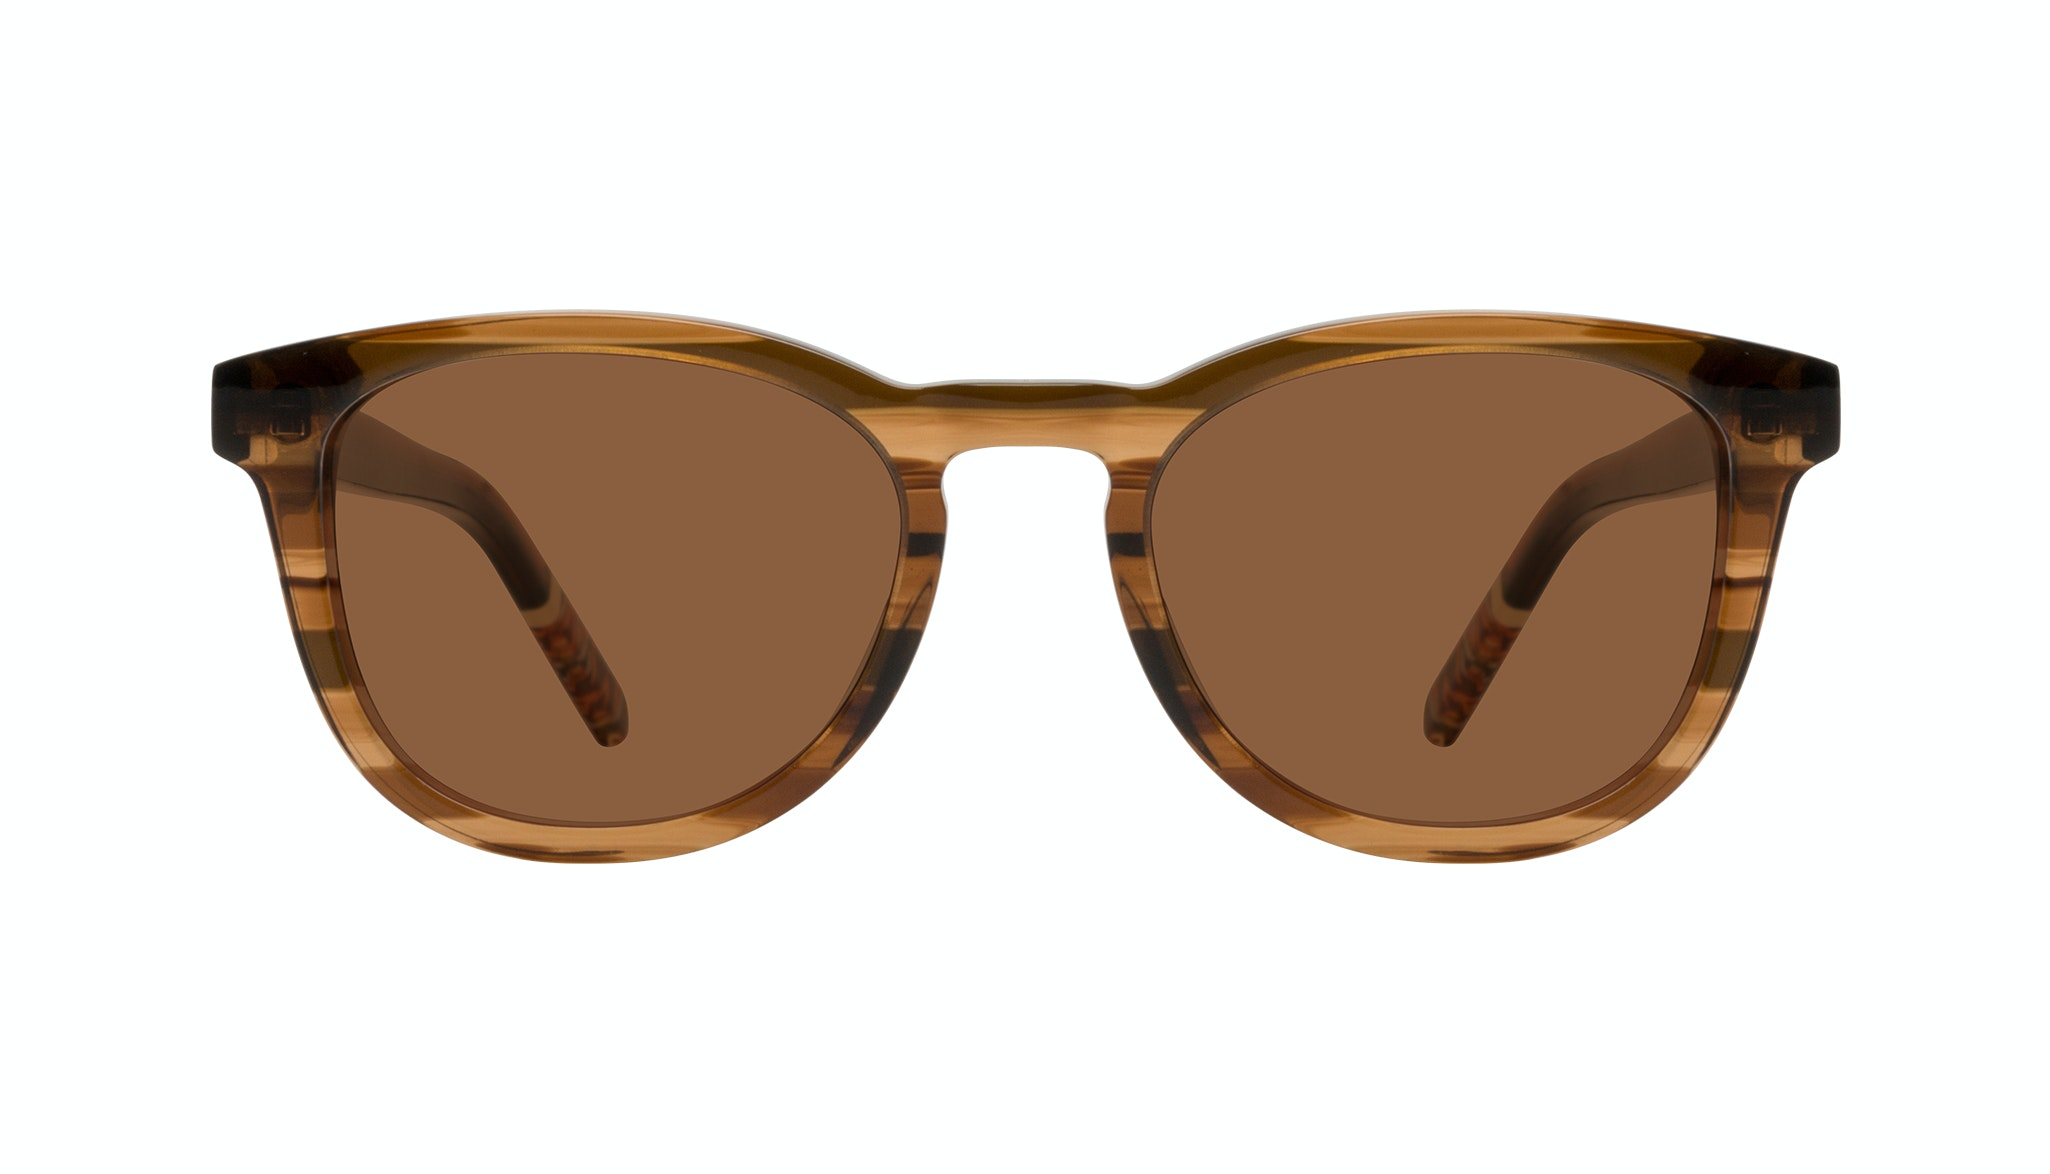 Affordable Fashion Glasses Round Sunglasses Men Goal Smokey Havana